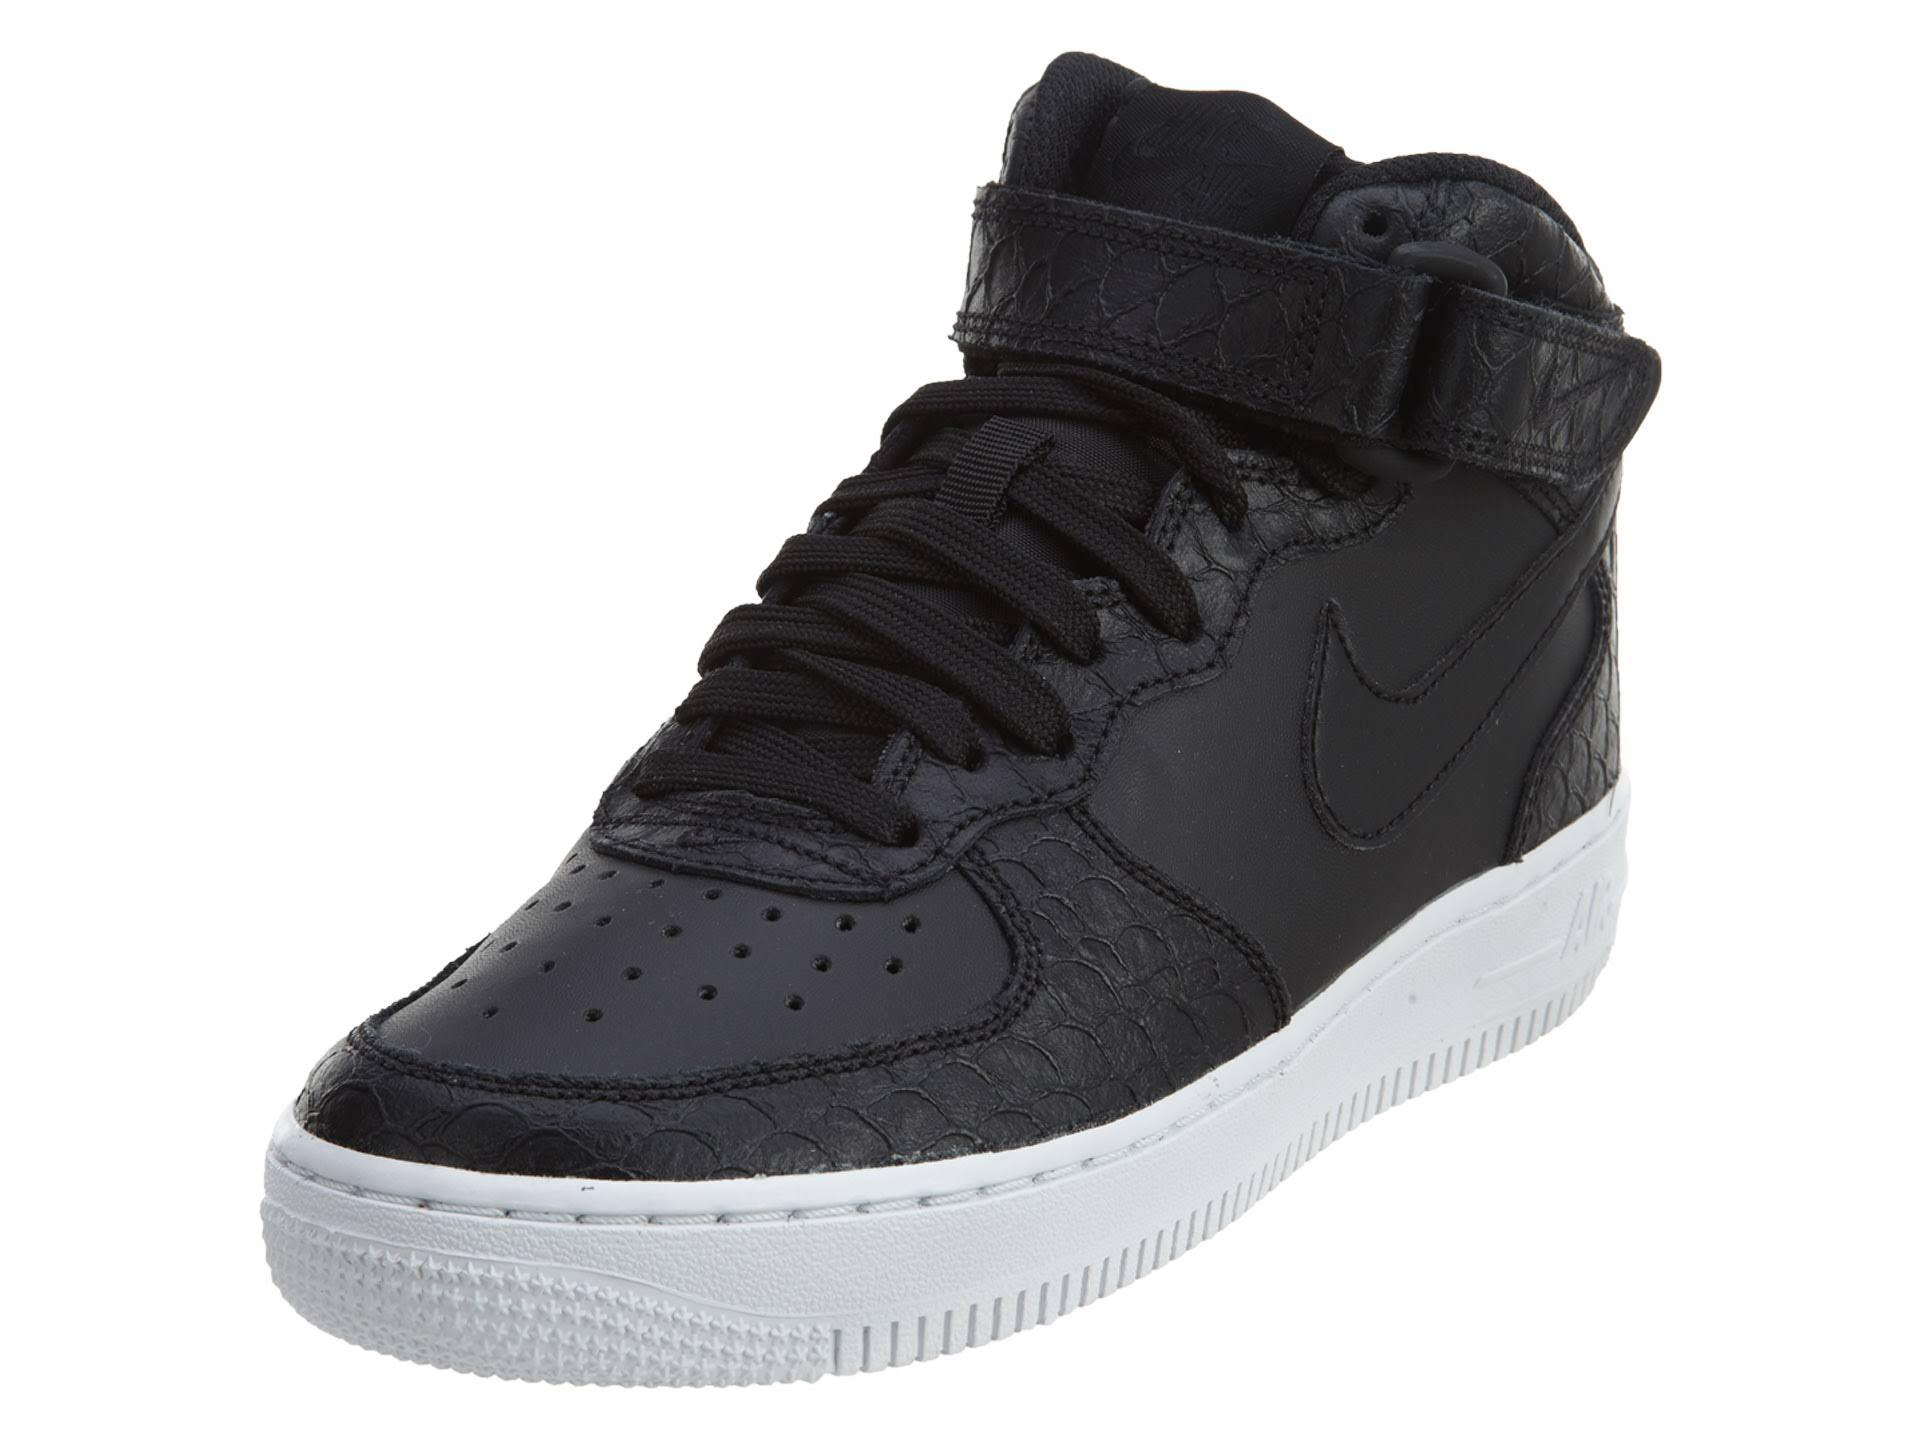 Mid 5 Negro wmns 820342 Sz Force 001 Negro 7 5y gs blanco 1 negro Nike Air Lv8 qv1tRt